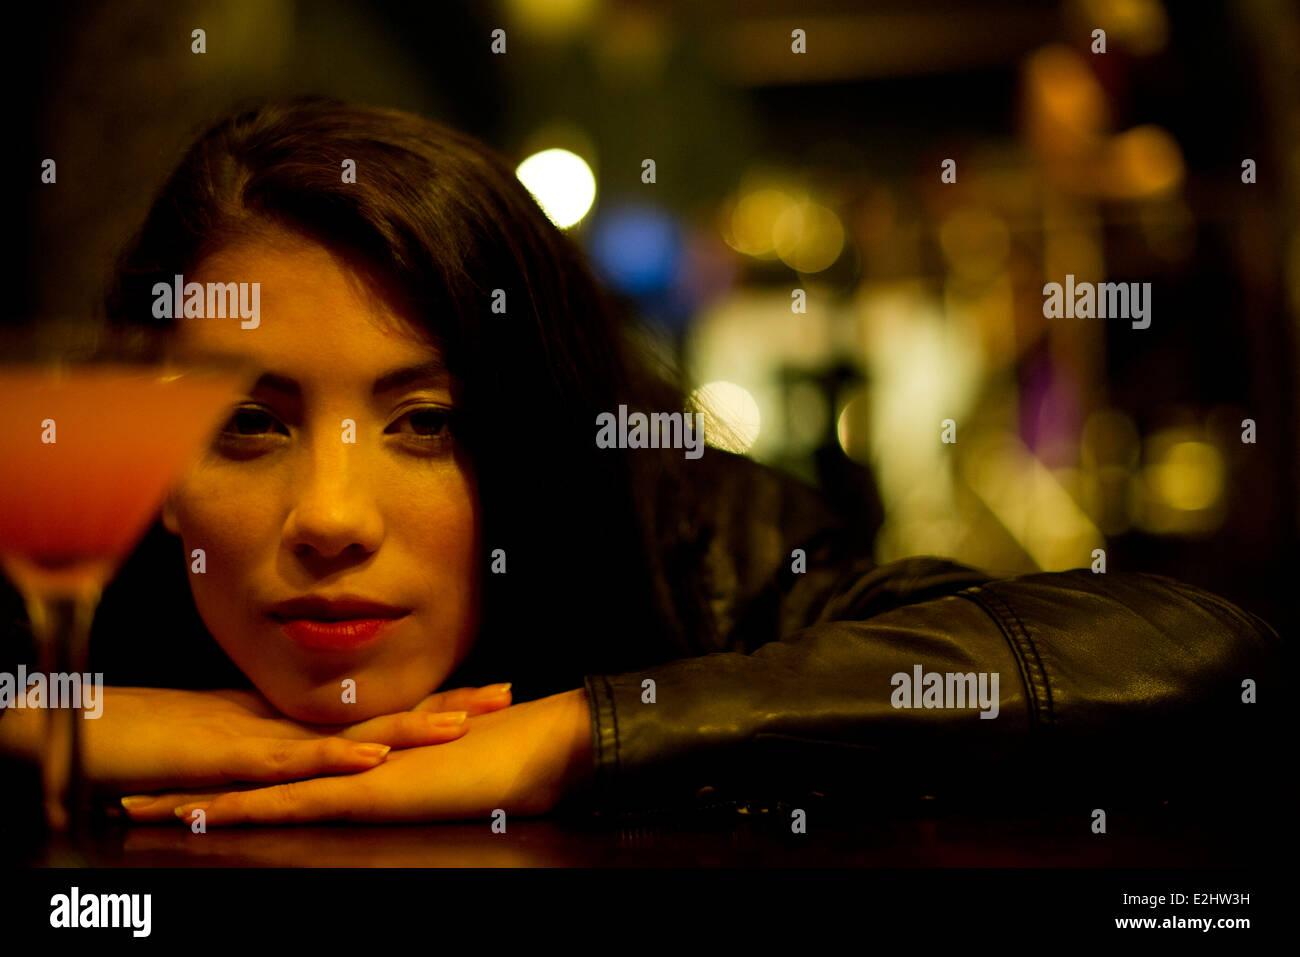 Woman drinking alone - Stock Image